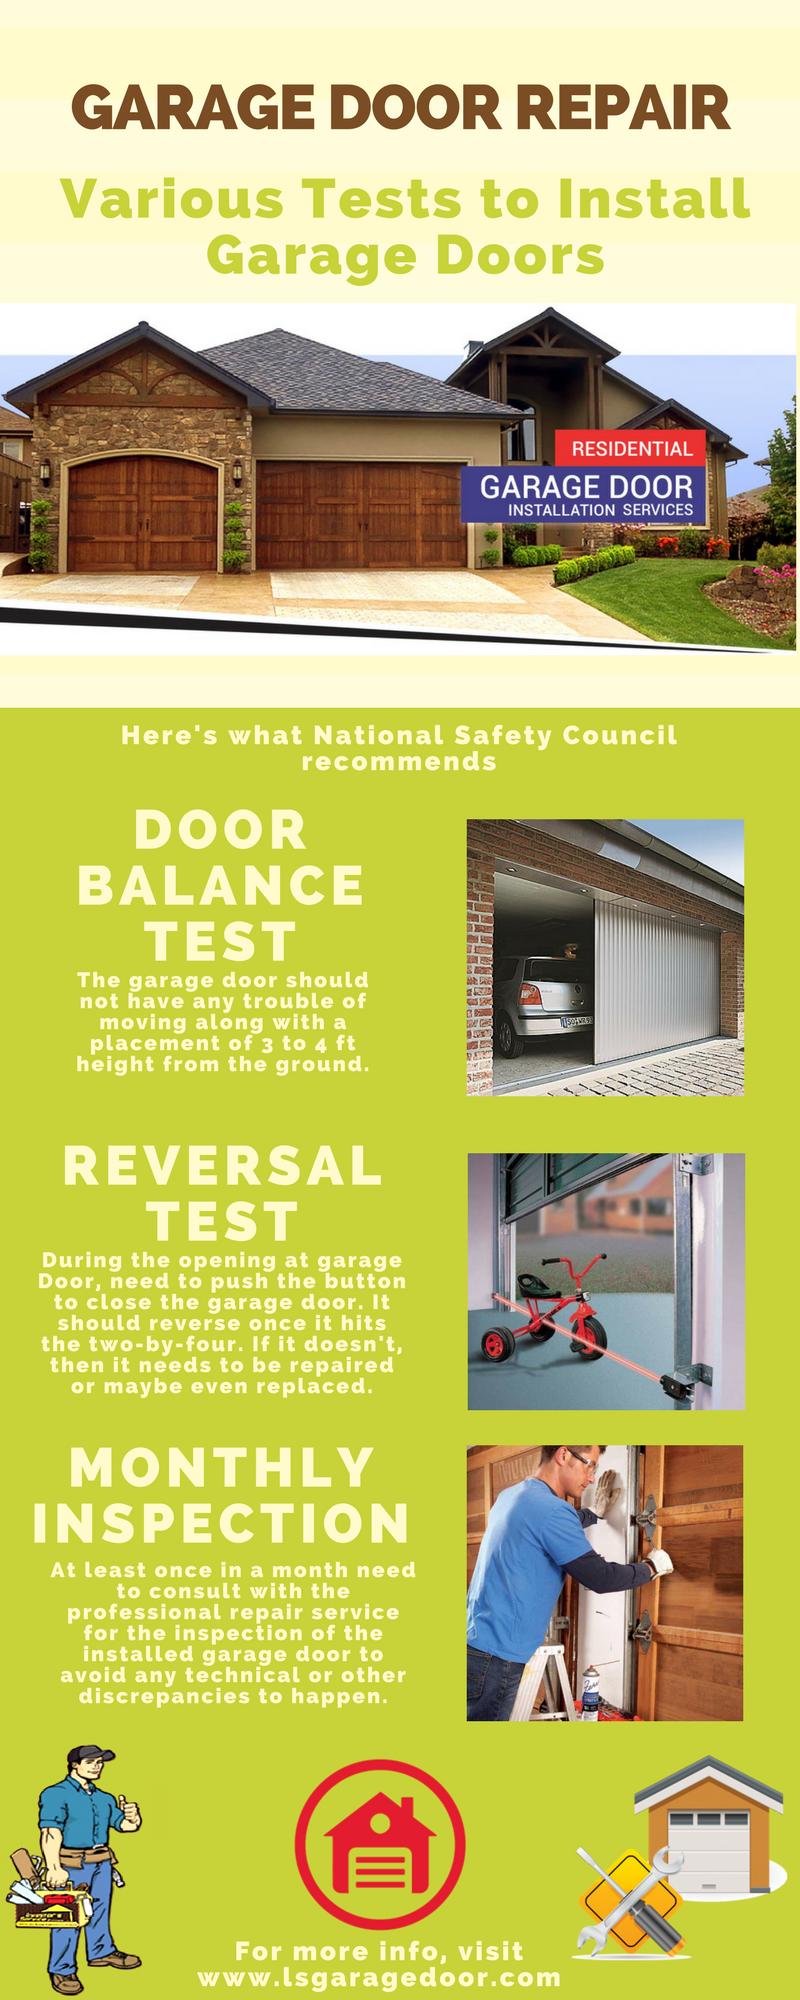 Garage Door Repair Service Requires Some Innovative Tests After